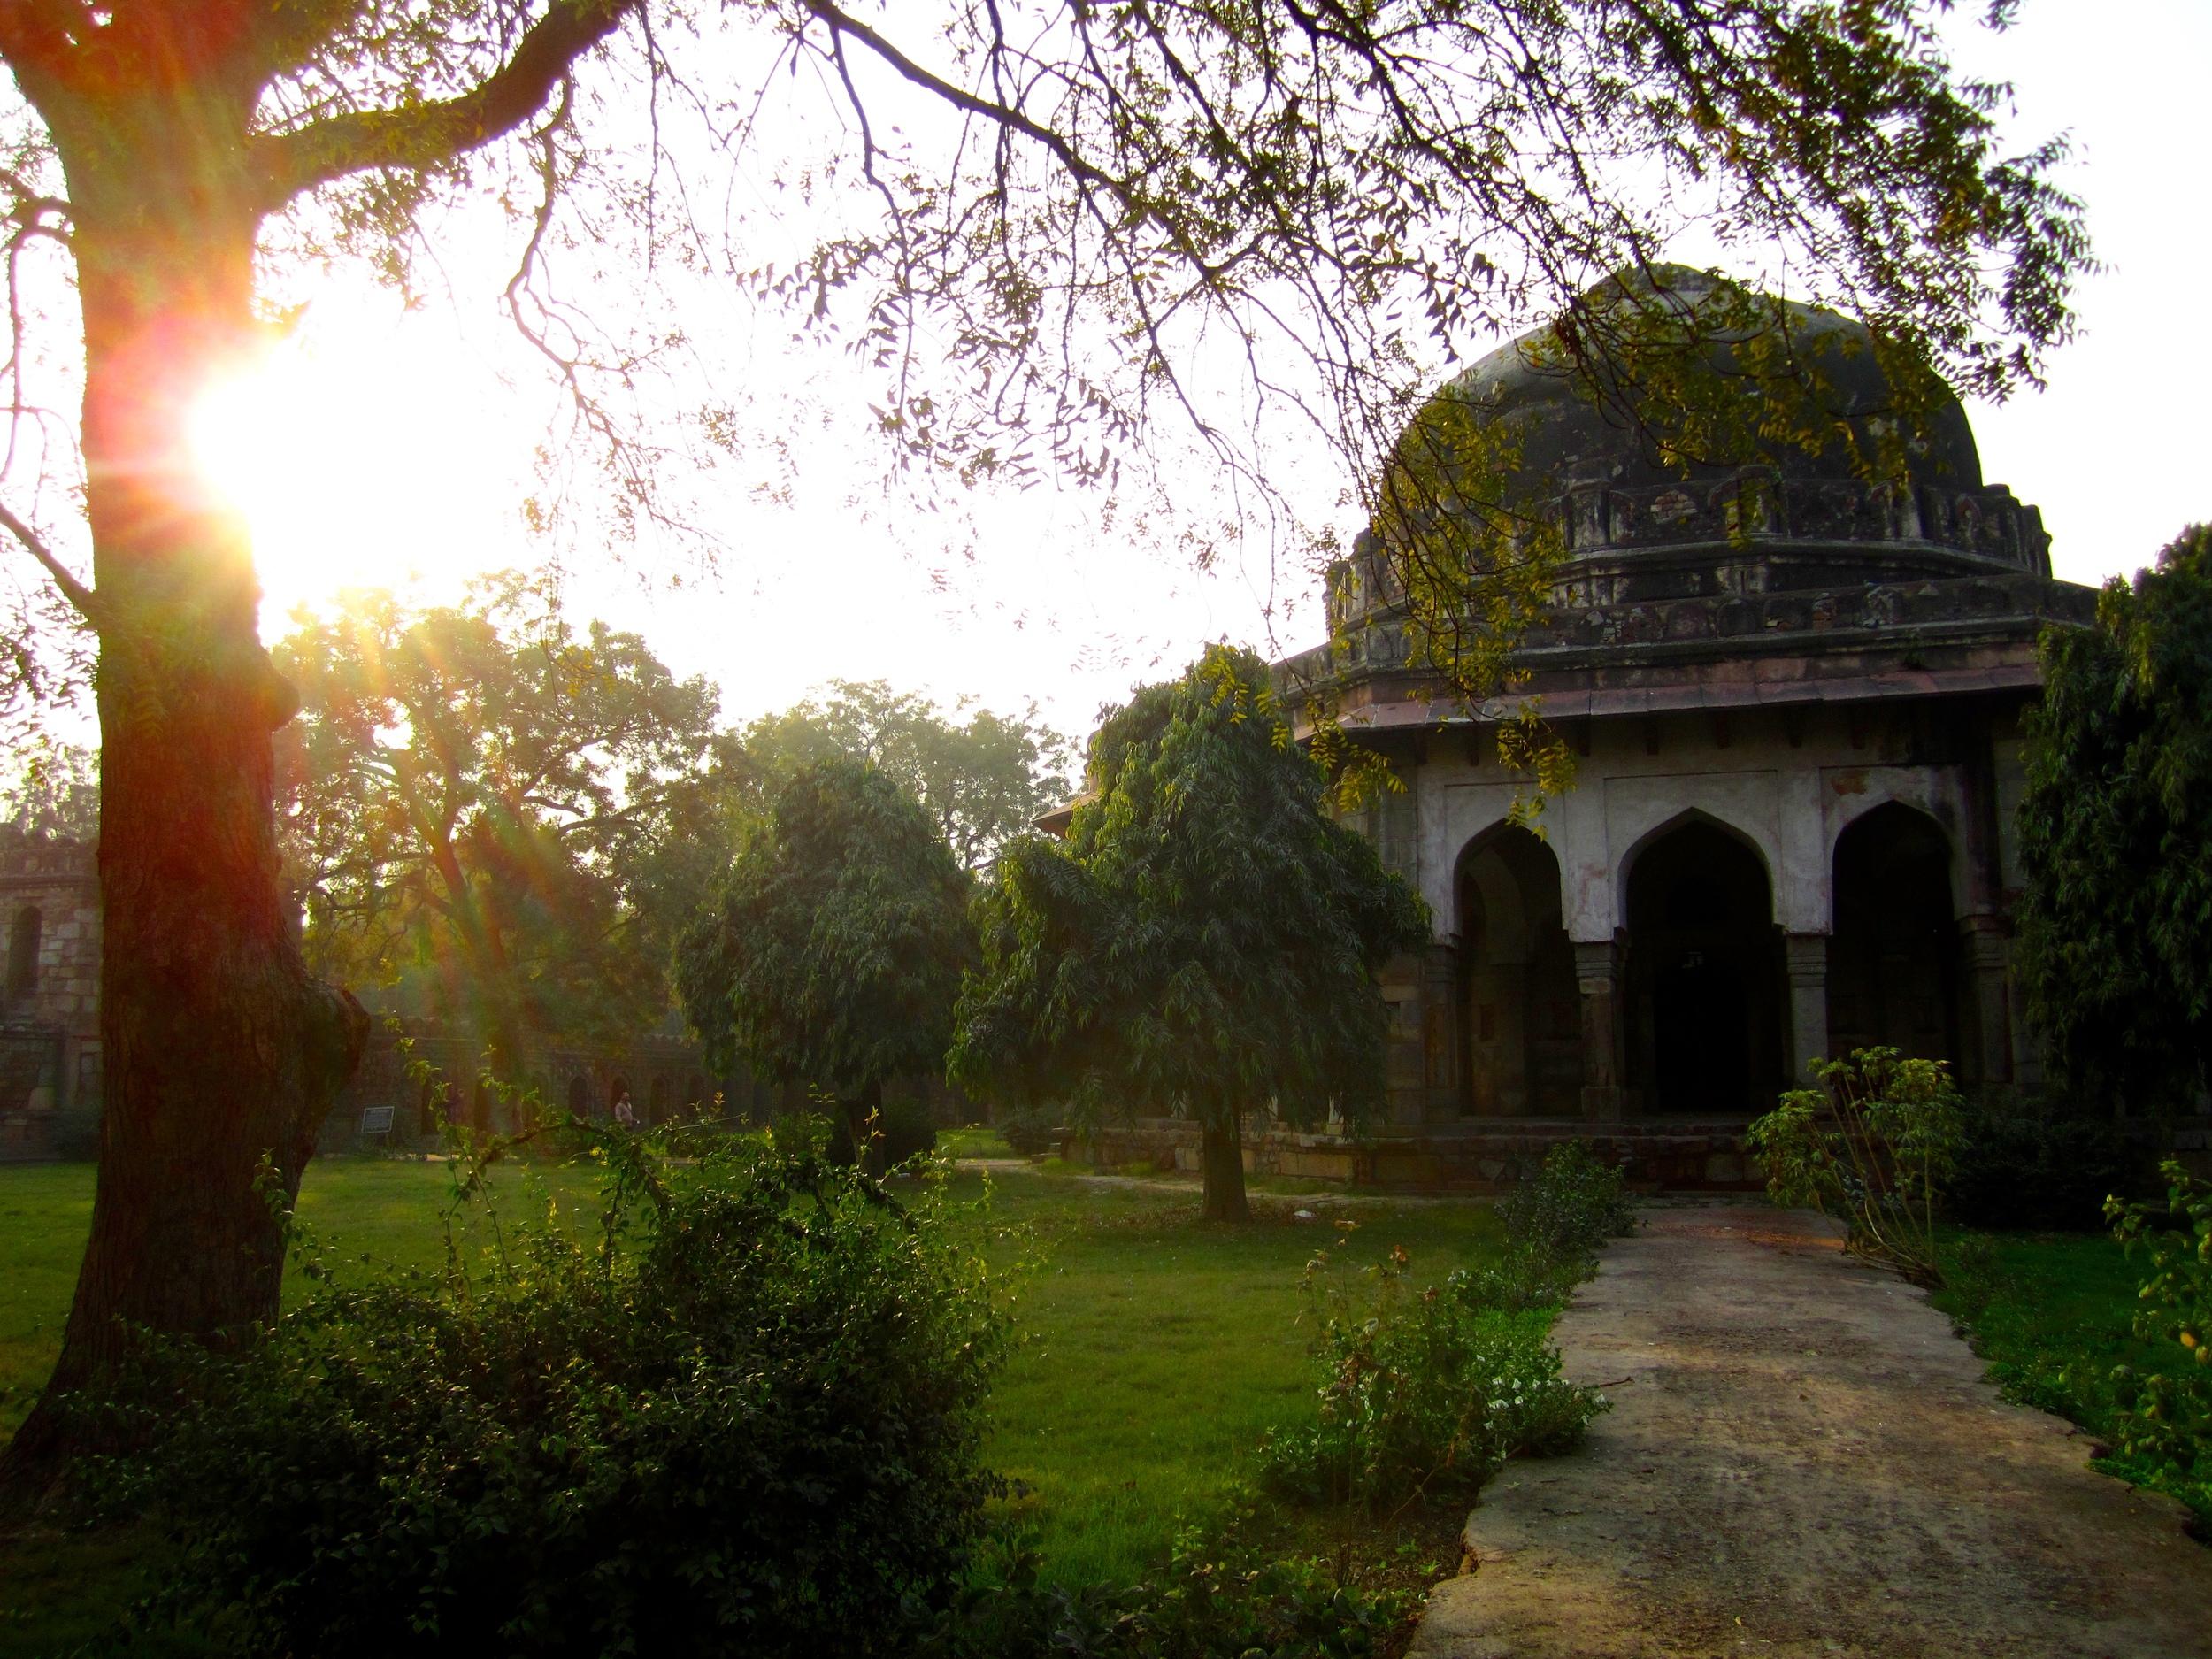 Delhi Agra 29Dec12 (24).jpg